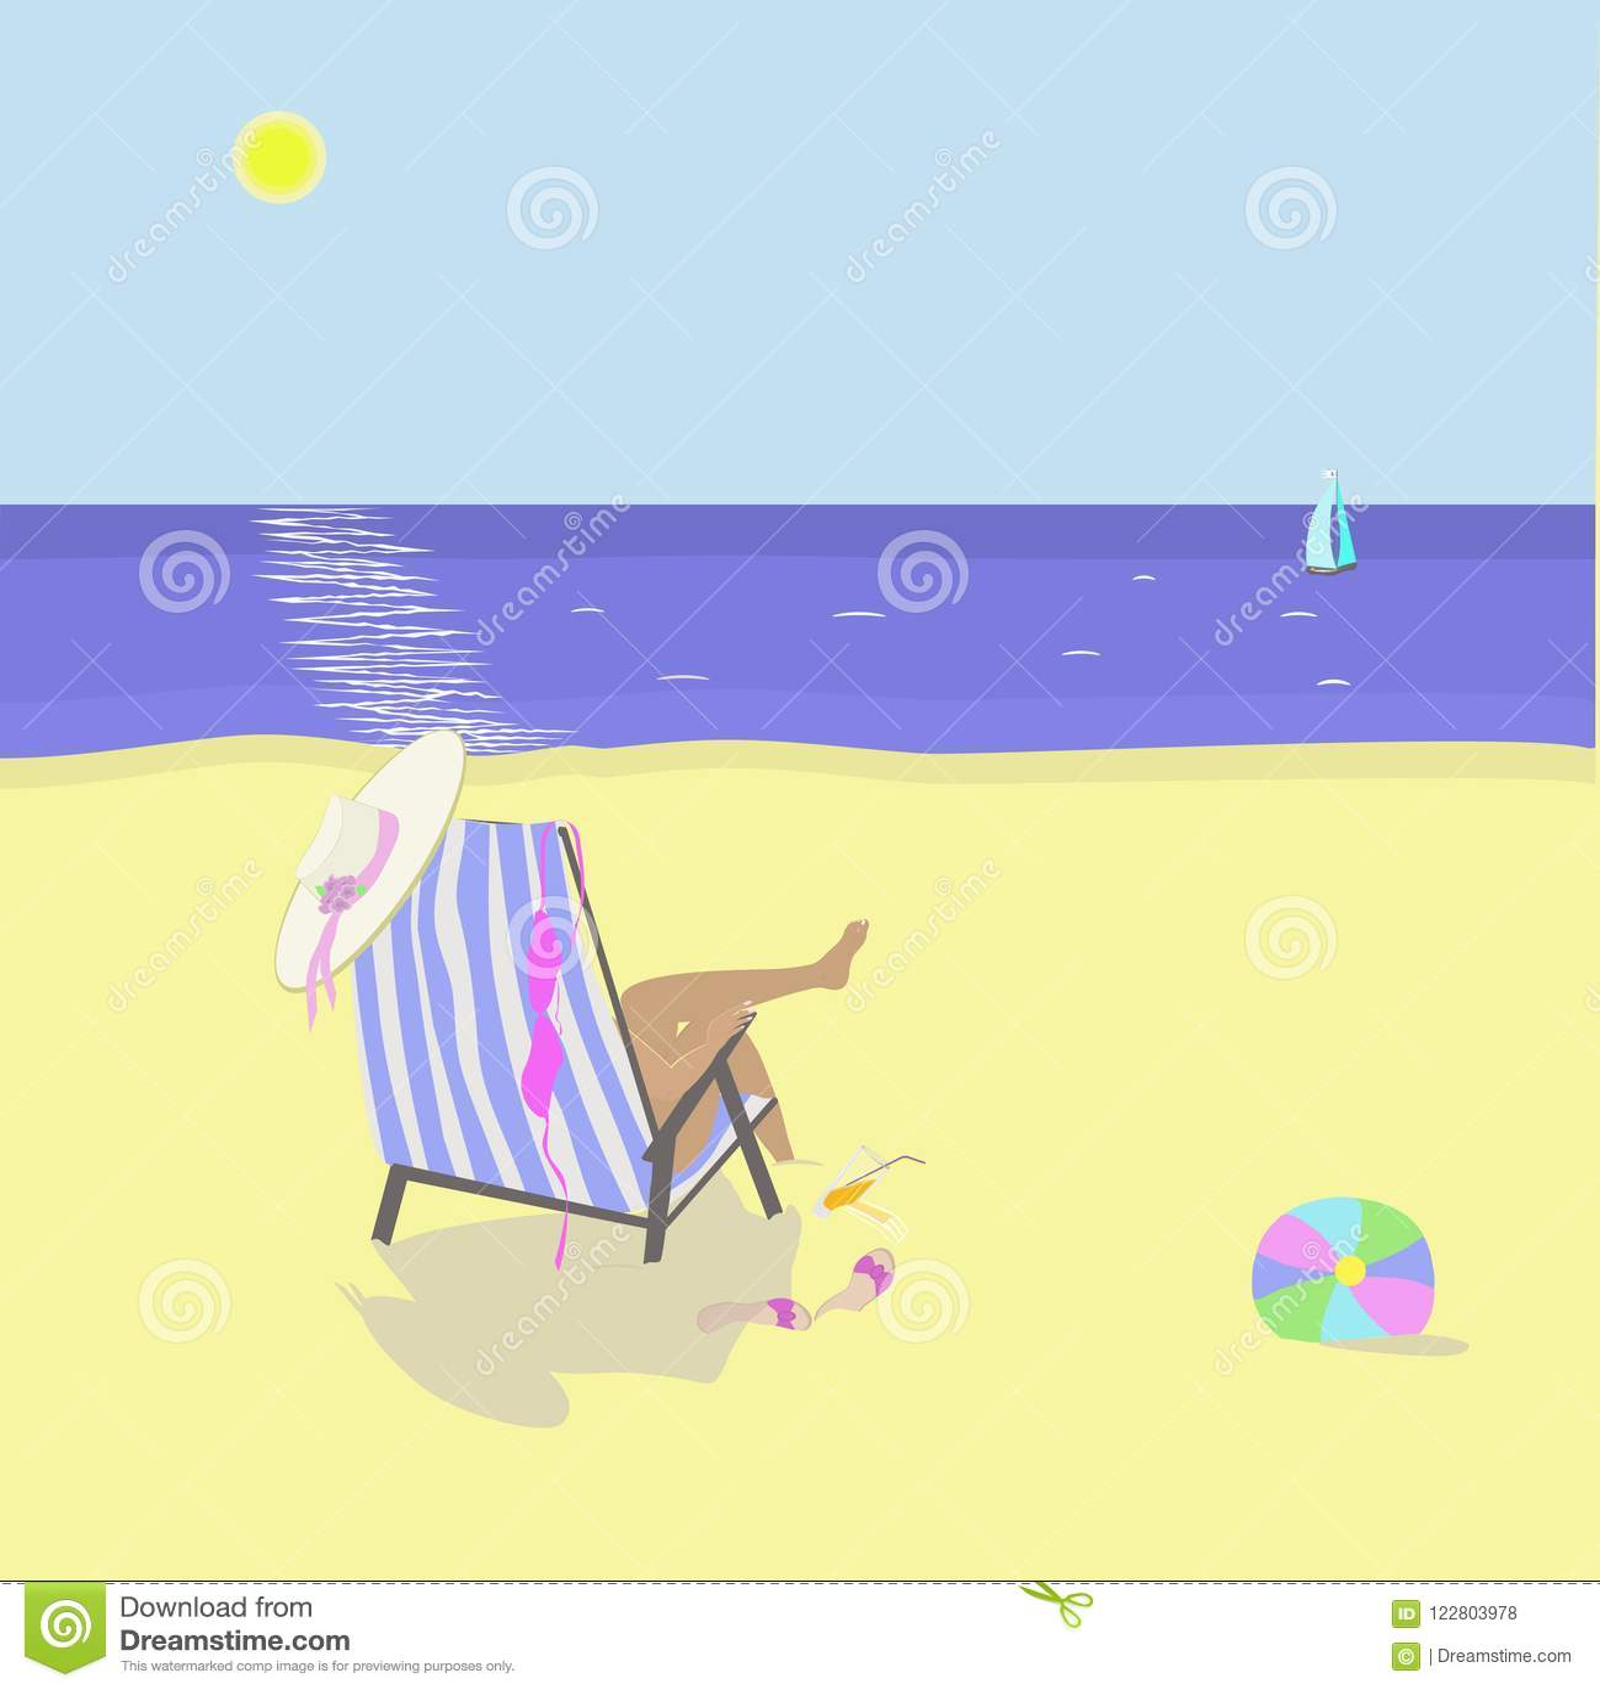 Beach scene. Woman relaxing in chaise-longue.